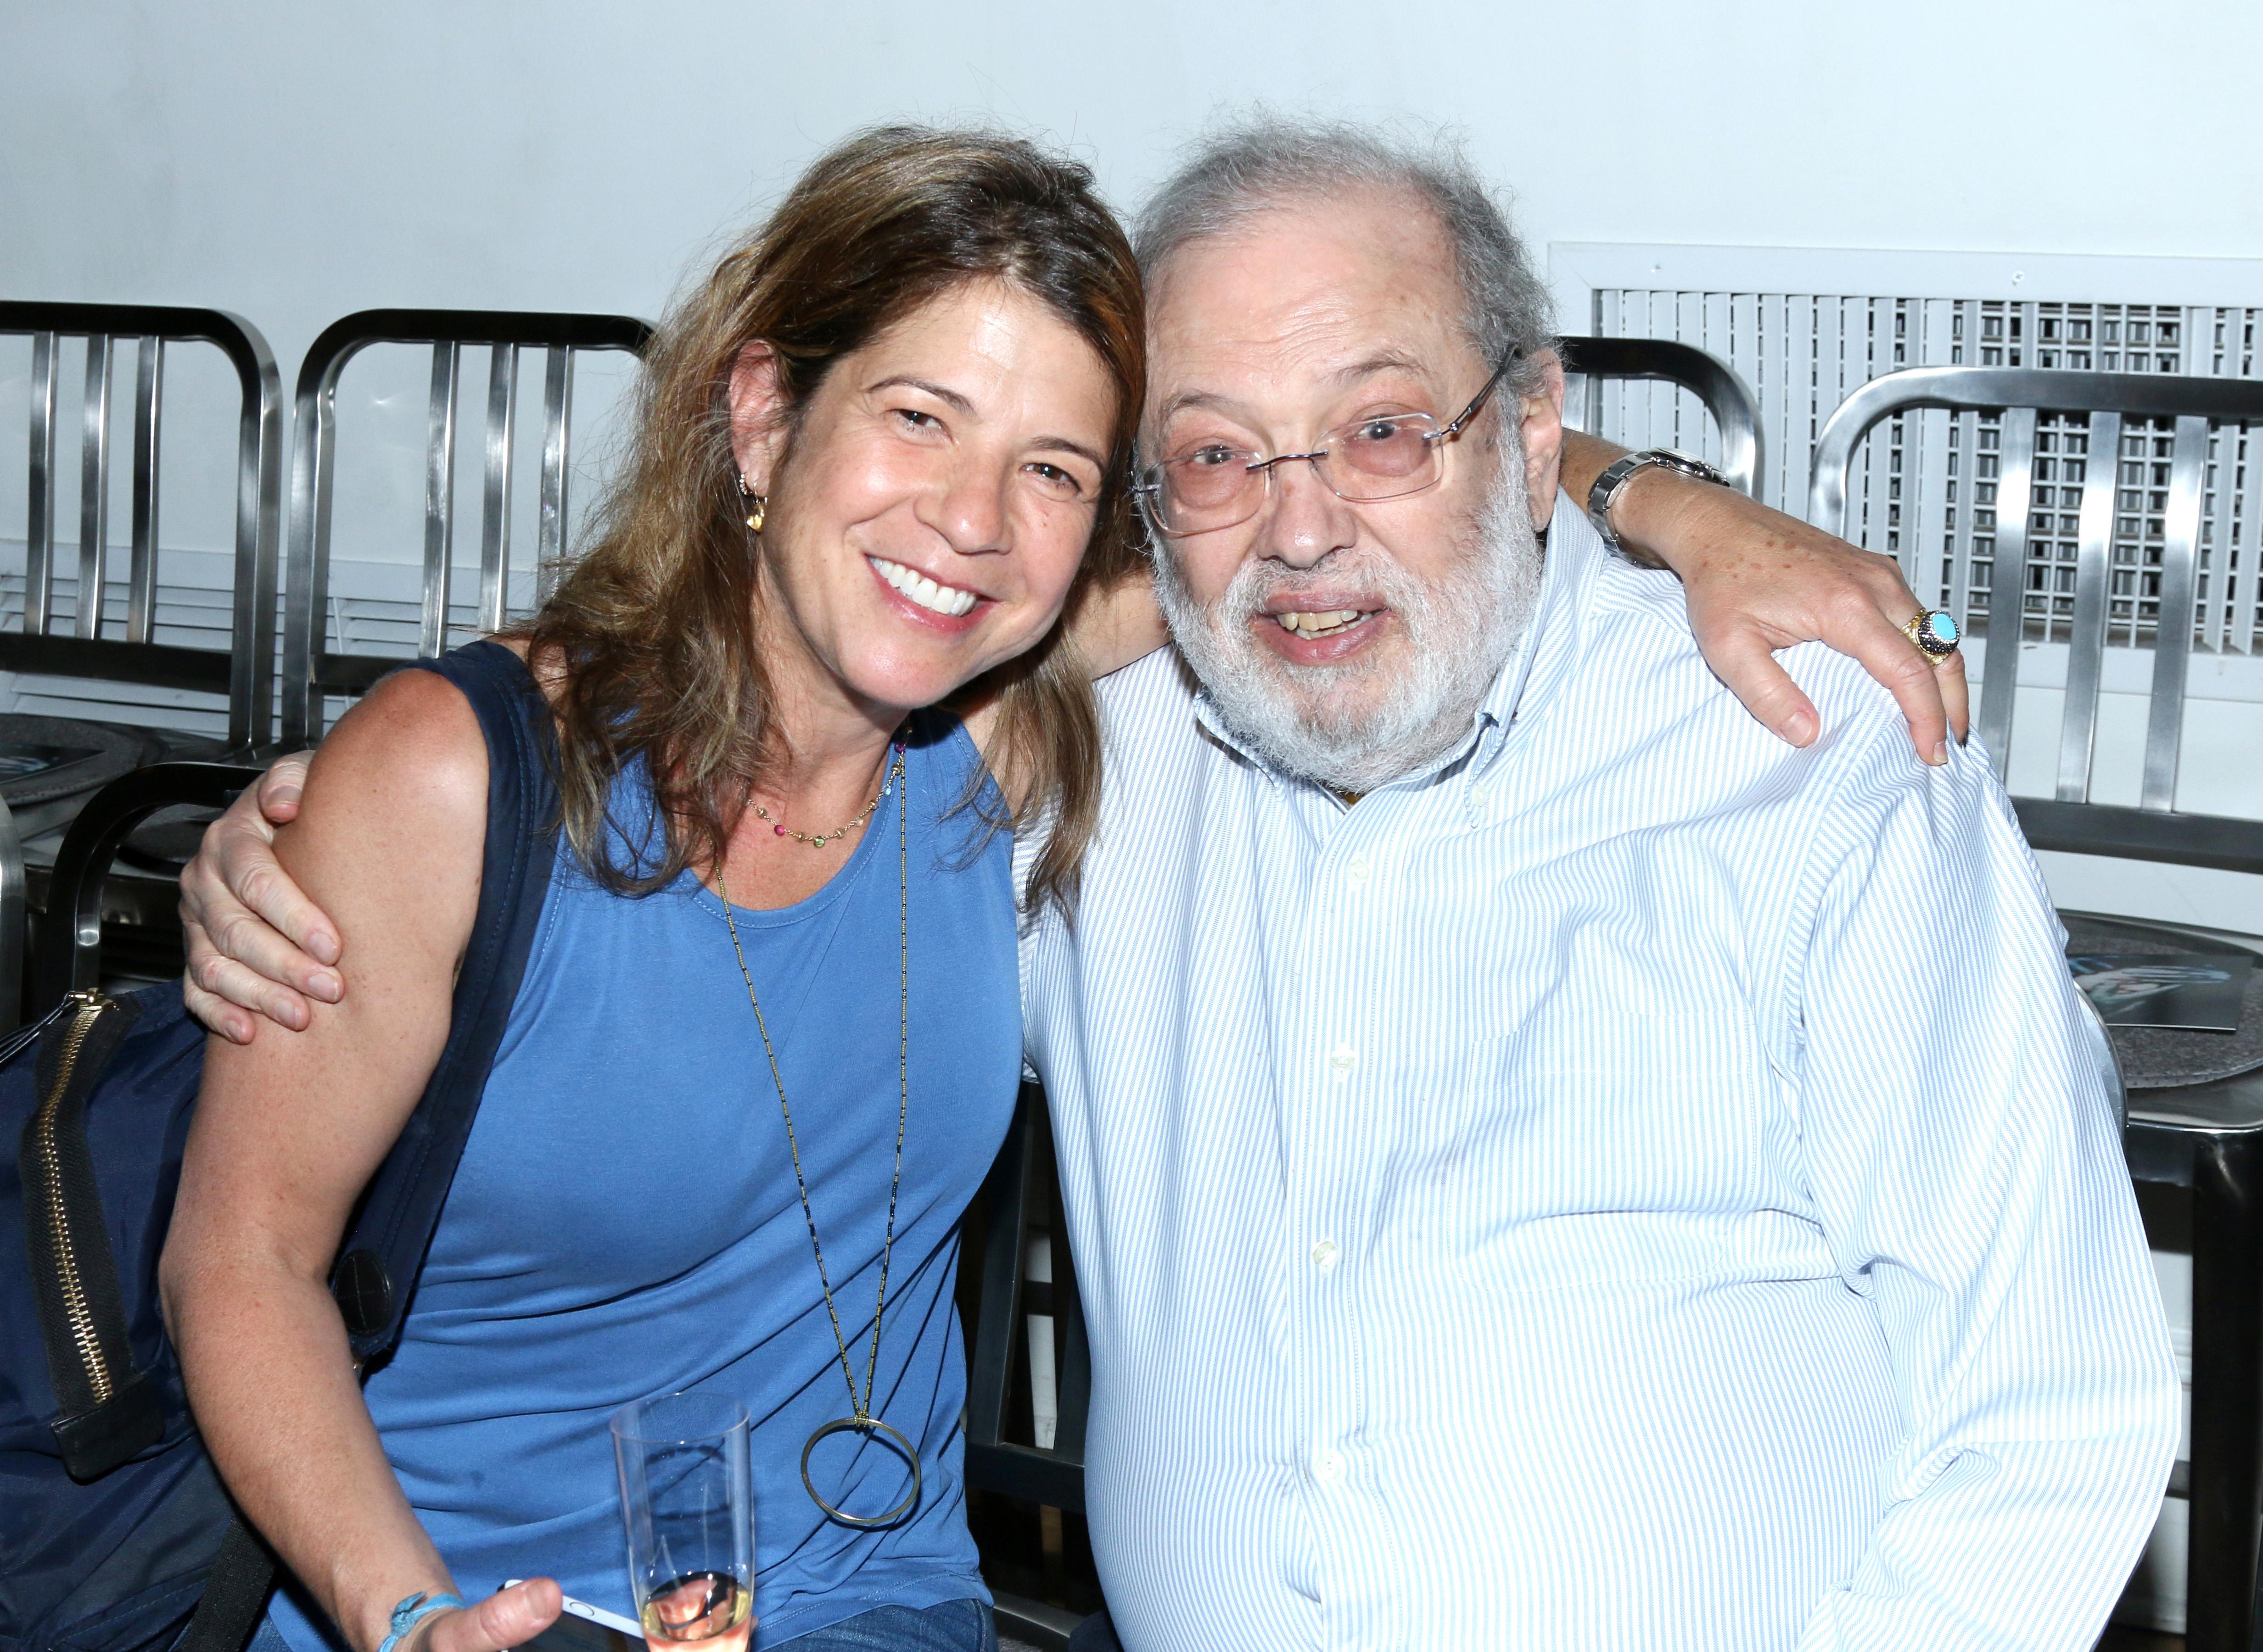 Lisa Apkon and Arthur Klampert (Axial Theater)